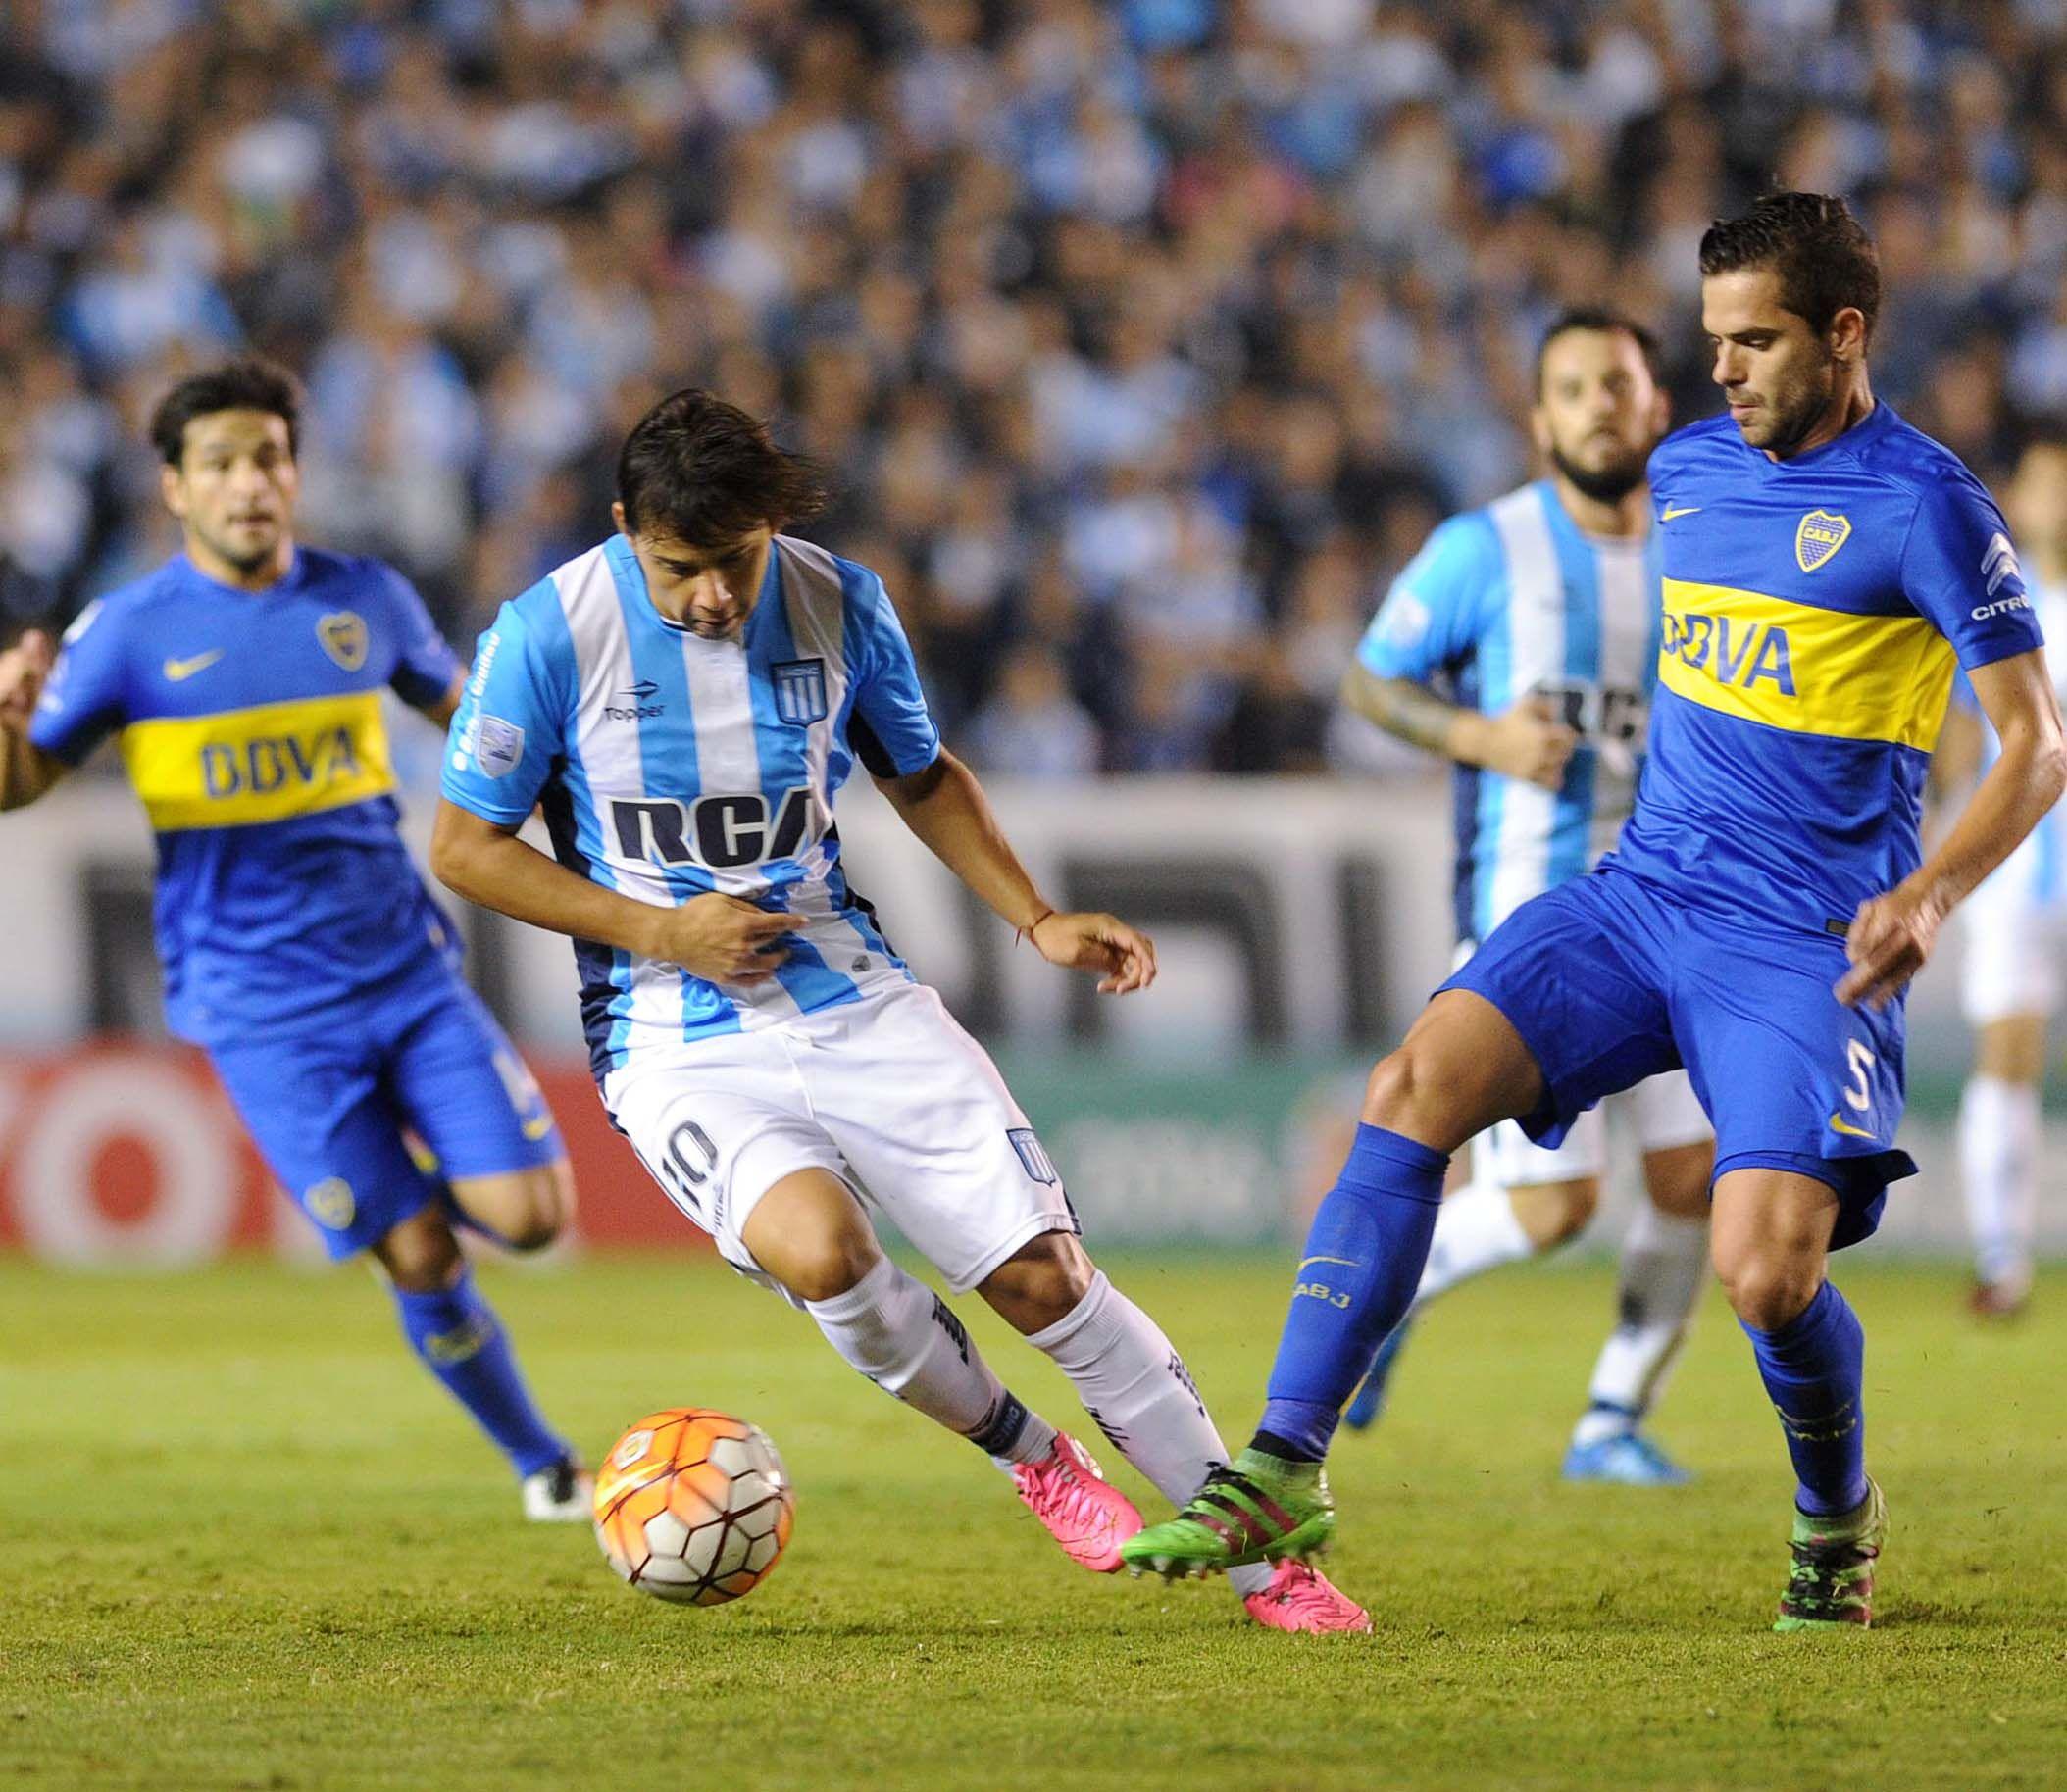 Boca le ganó a Racing en Avellaneda y clasificó a octavos de la Libertadores